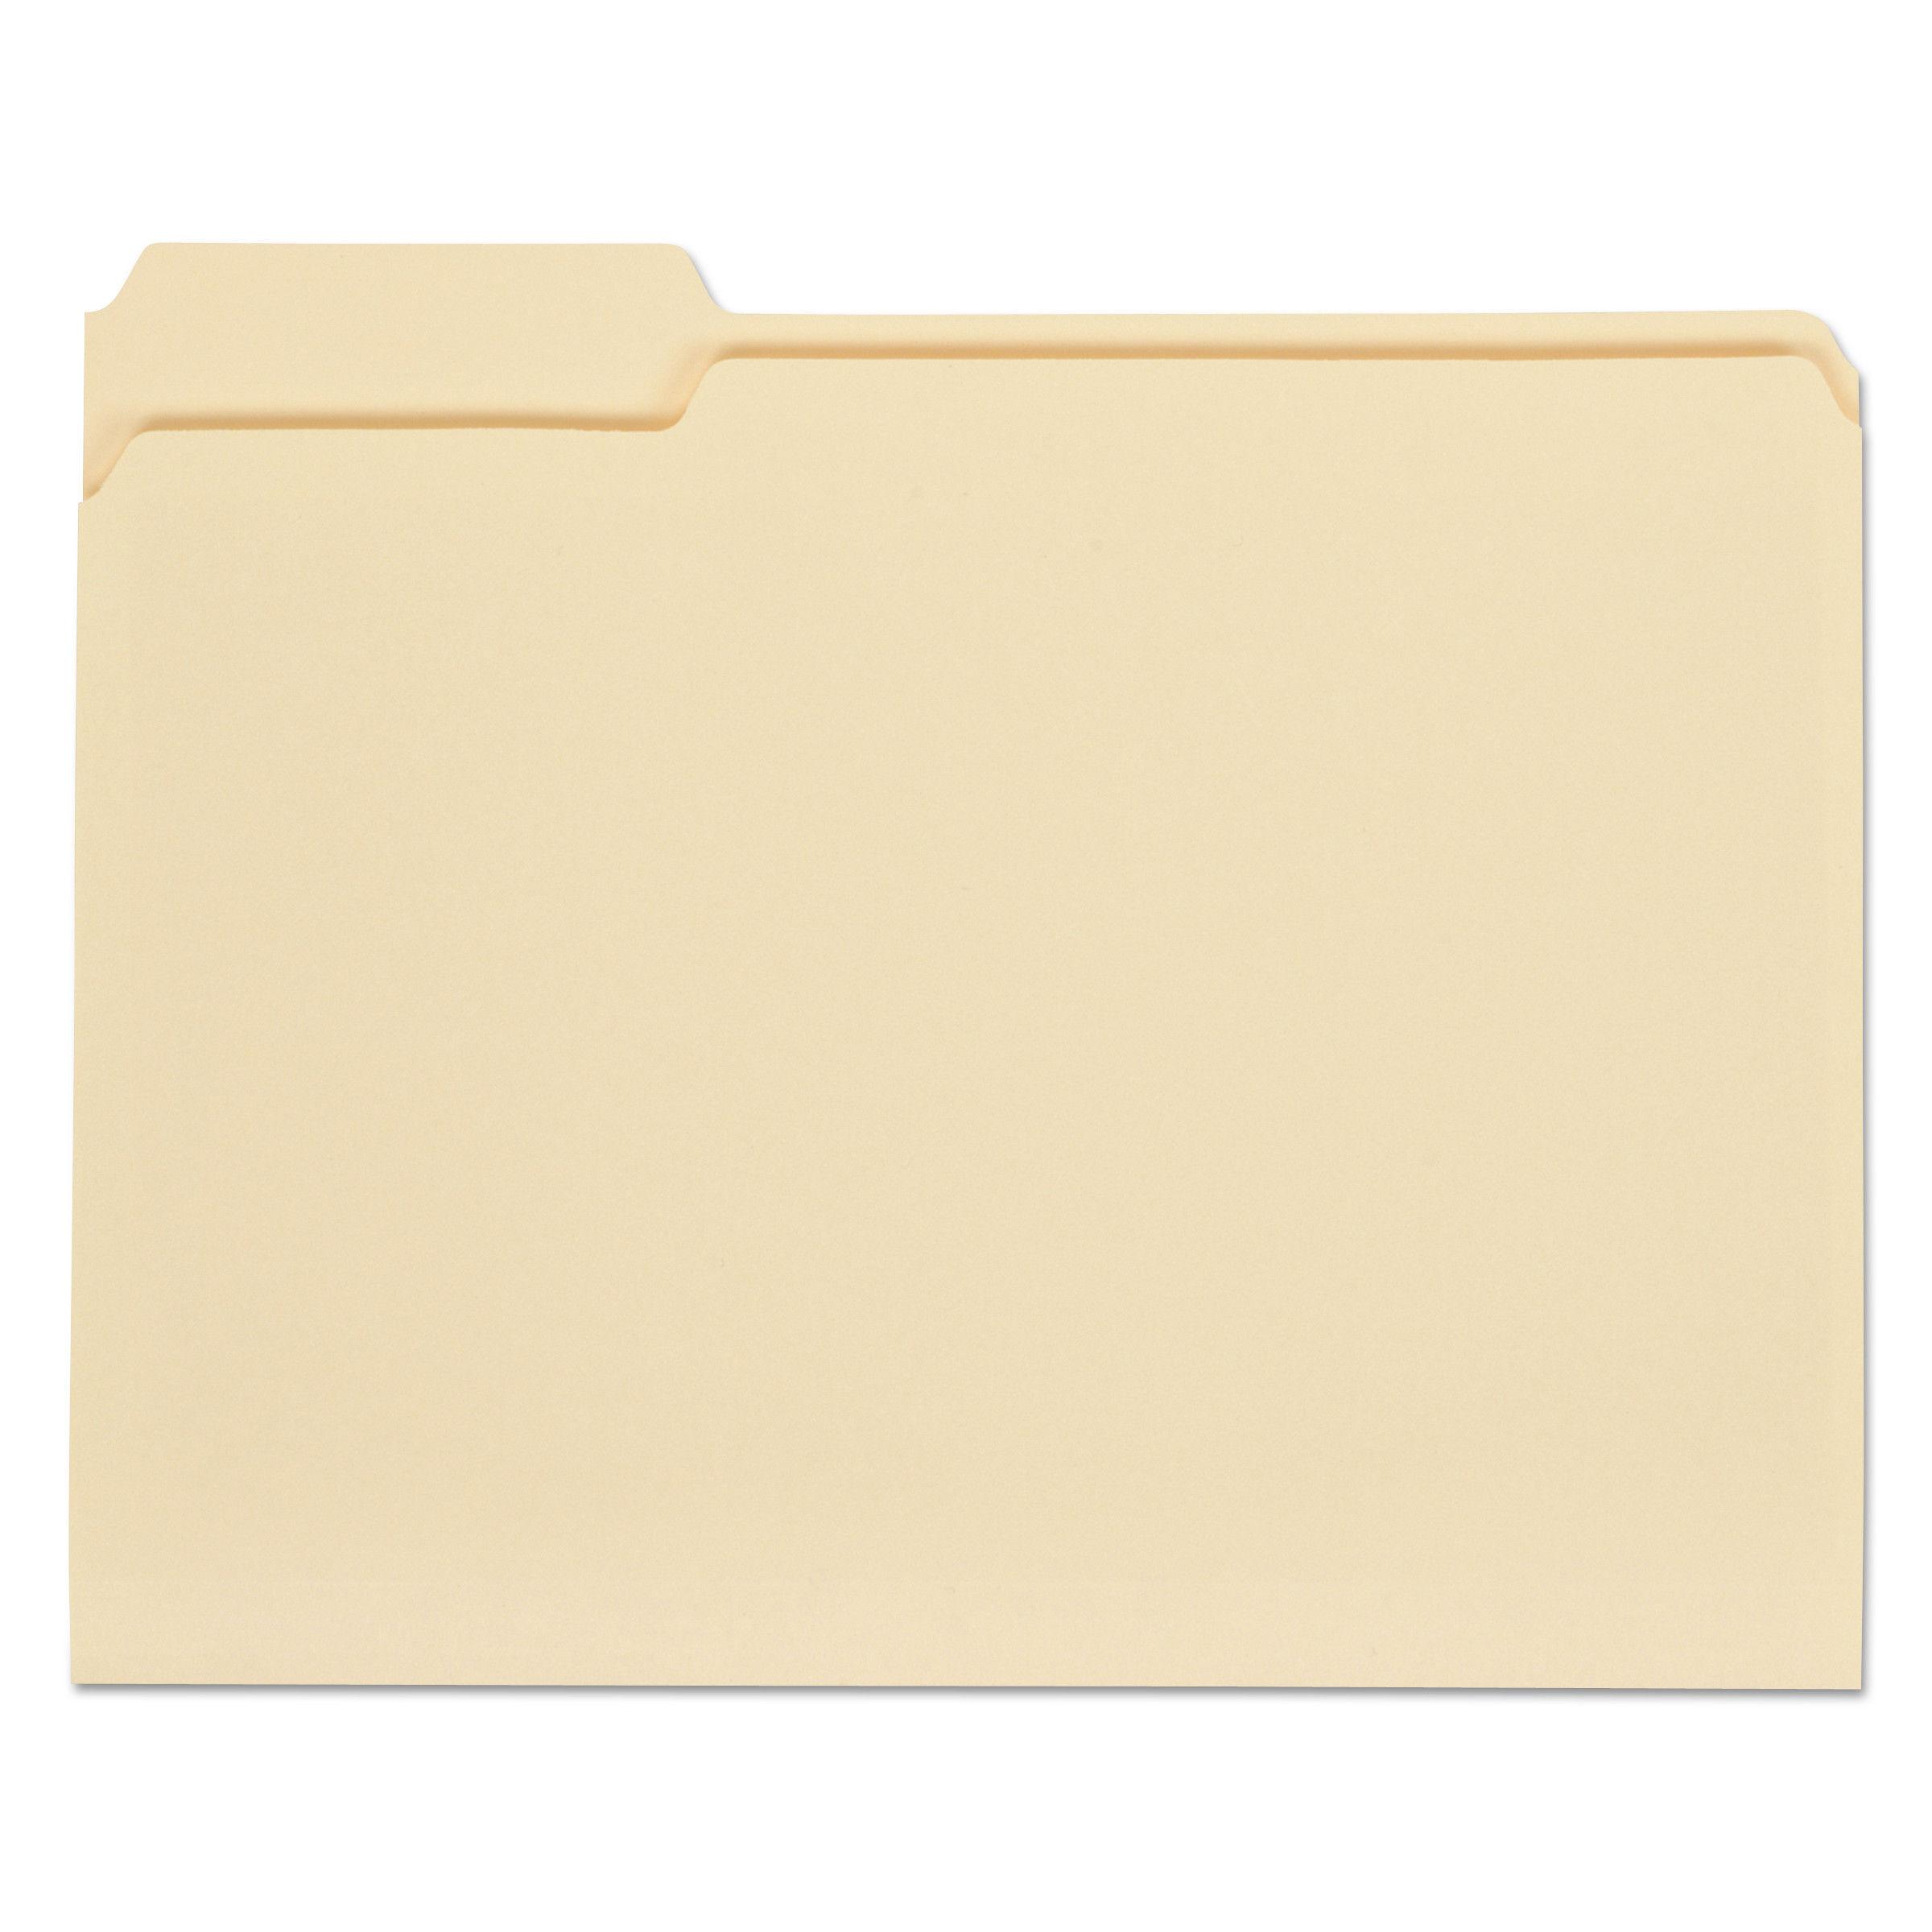 100 ct. Office Depot File Folders 1//3 Cut Assorted Top Tab Letter Size Manila